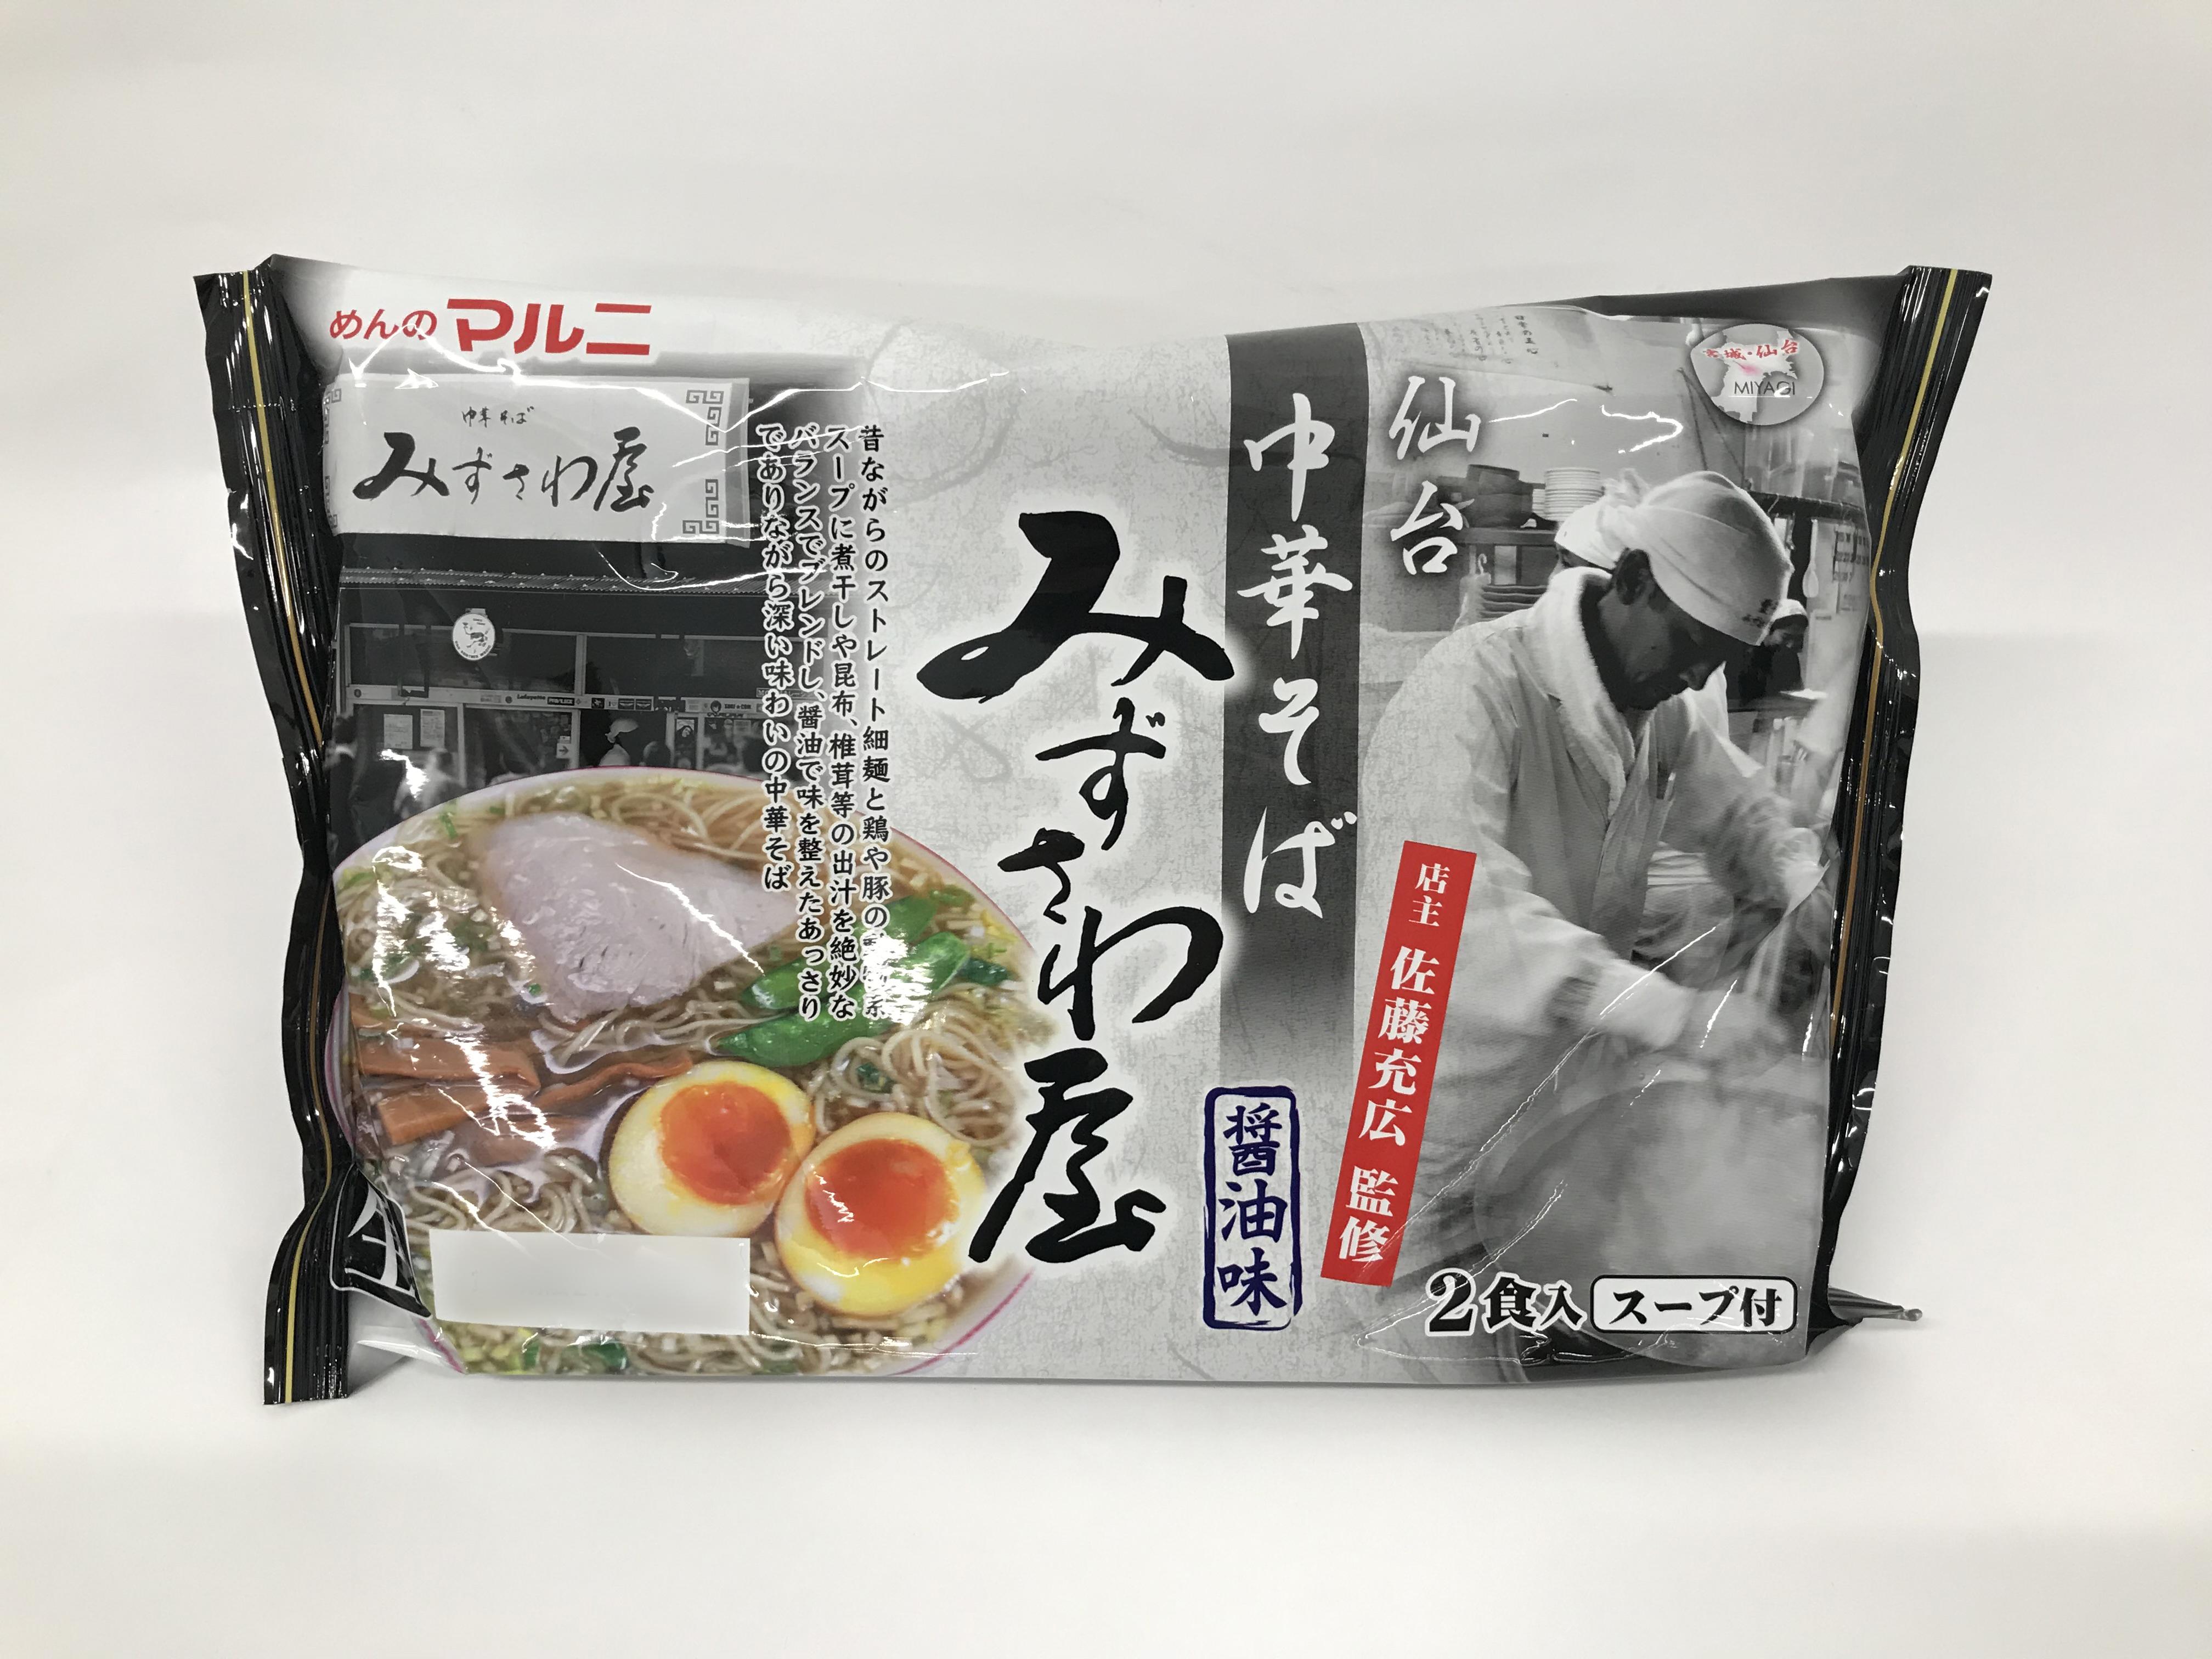 Sendai Ramen Noodle Mizusawa-ya